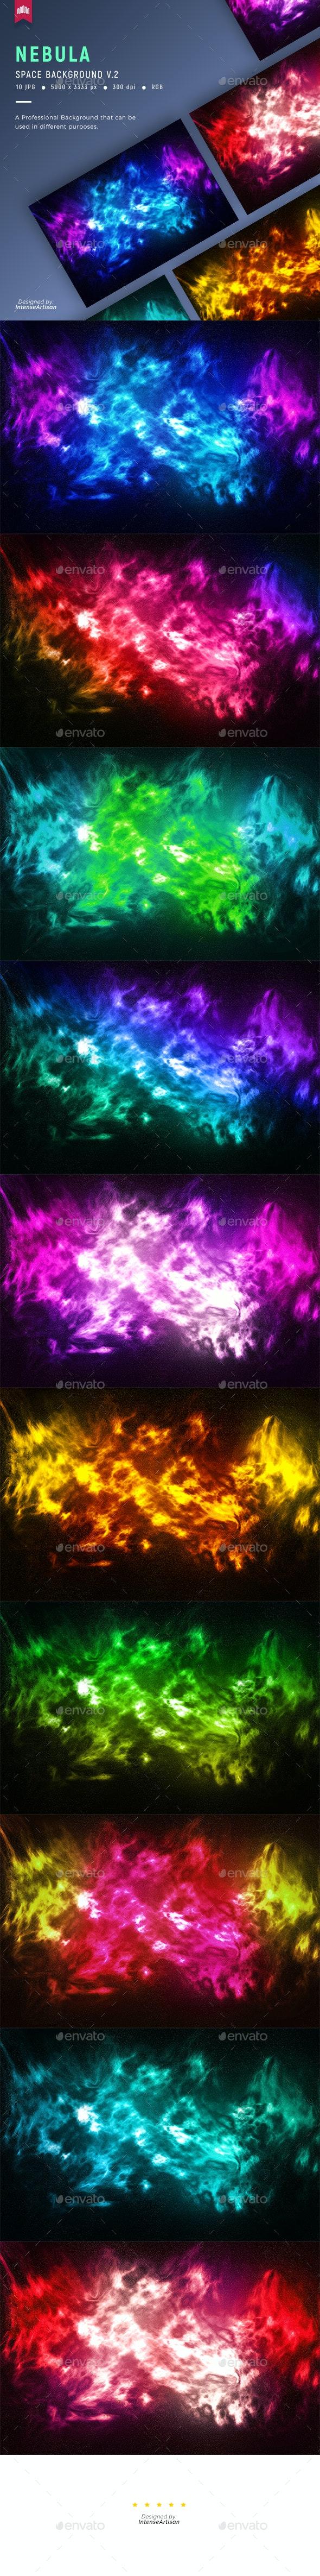 Nebula Space Background V.2 - Abstract Backgrounds